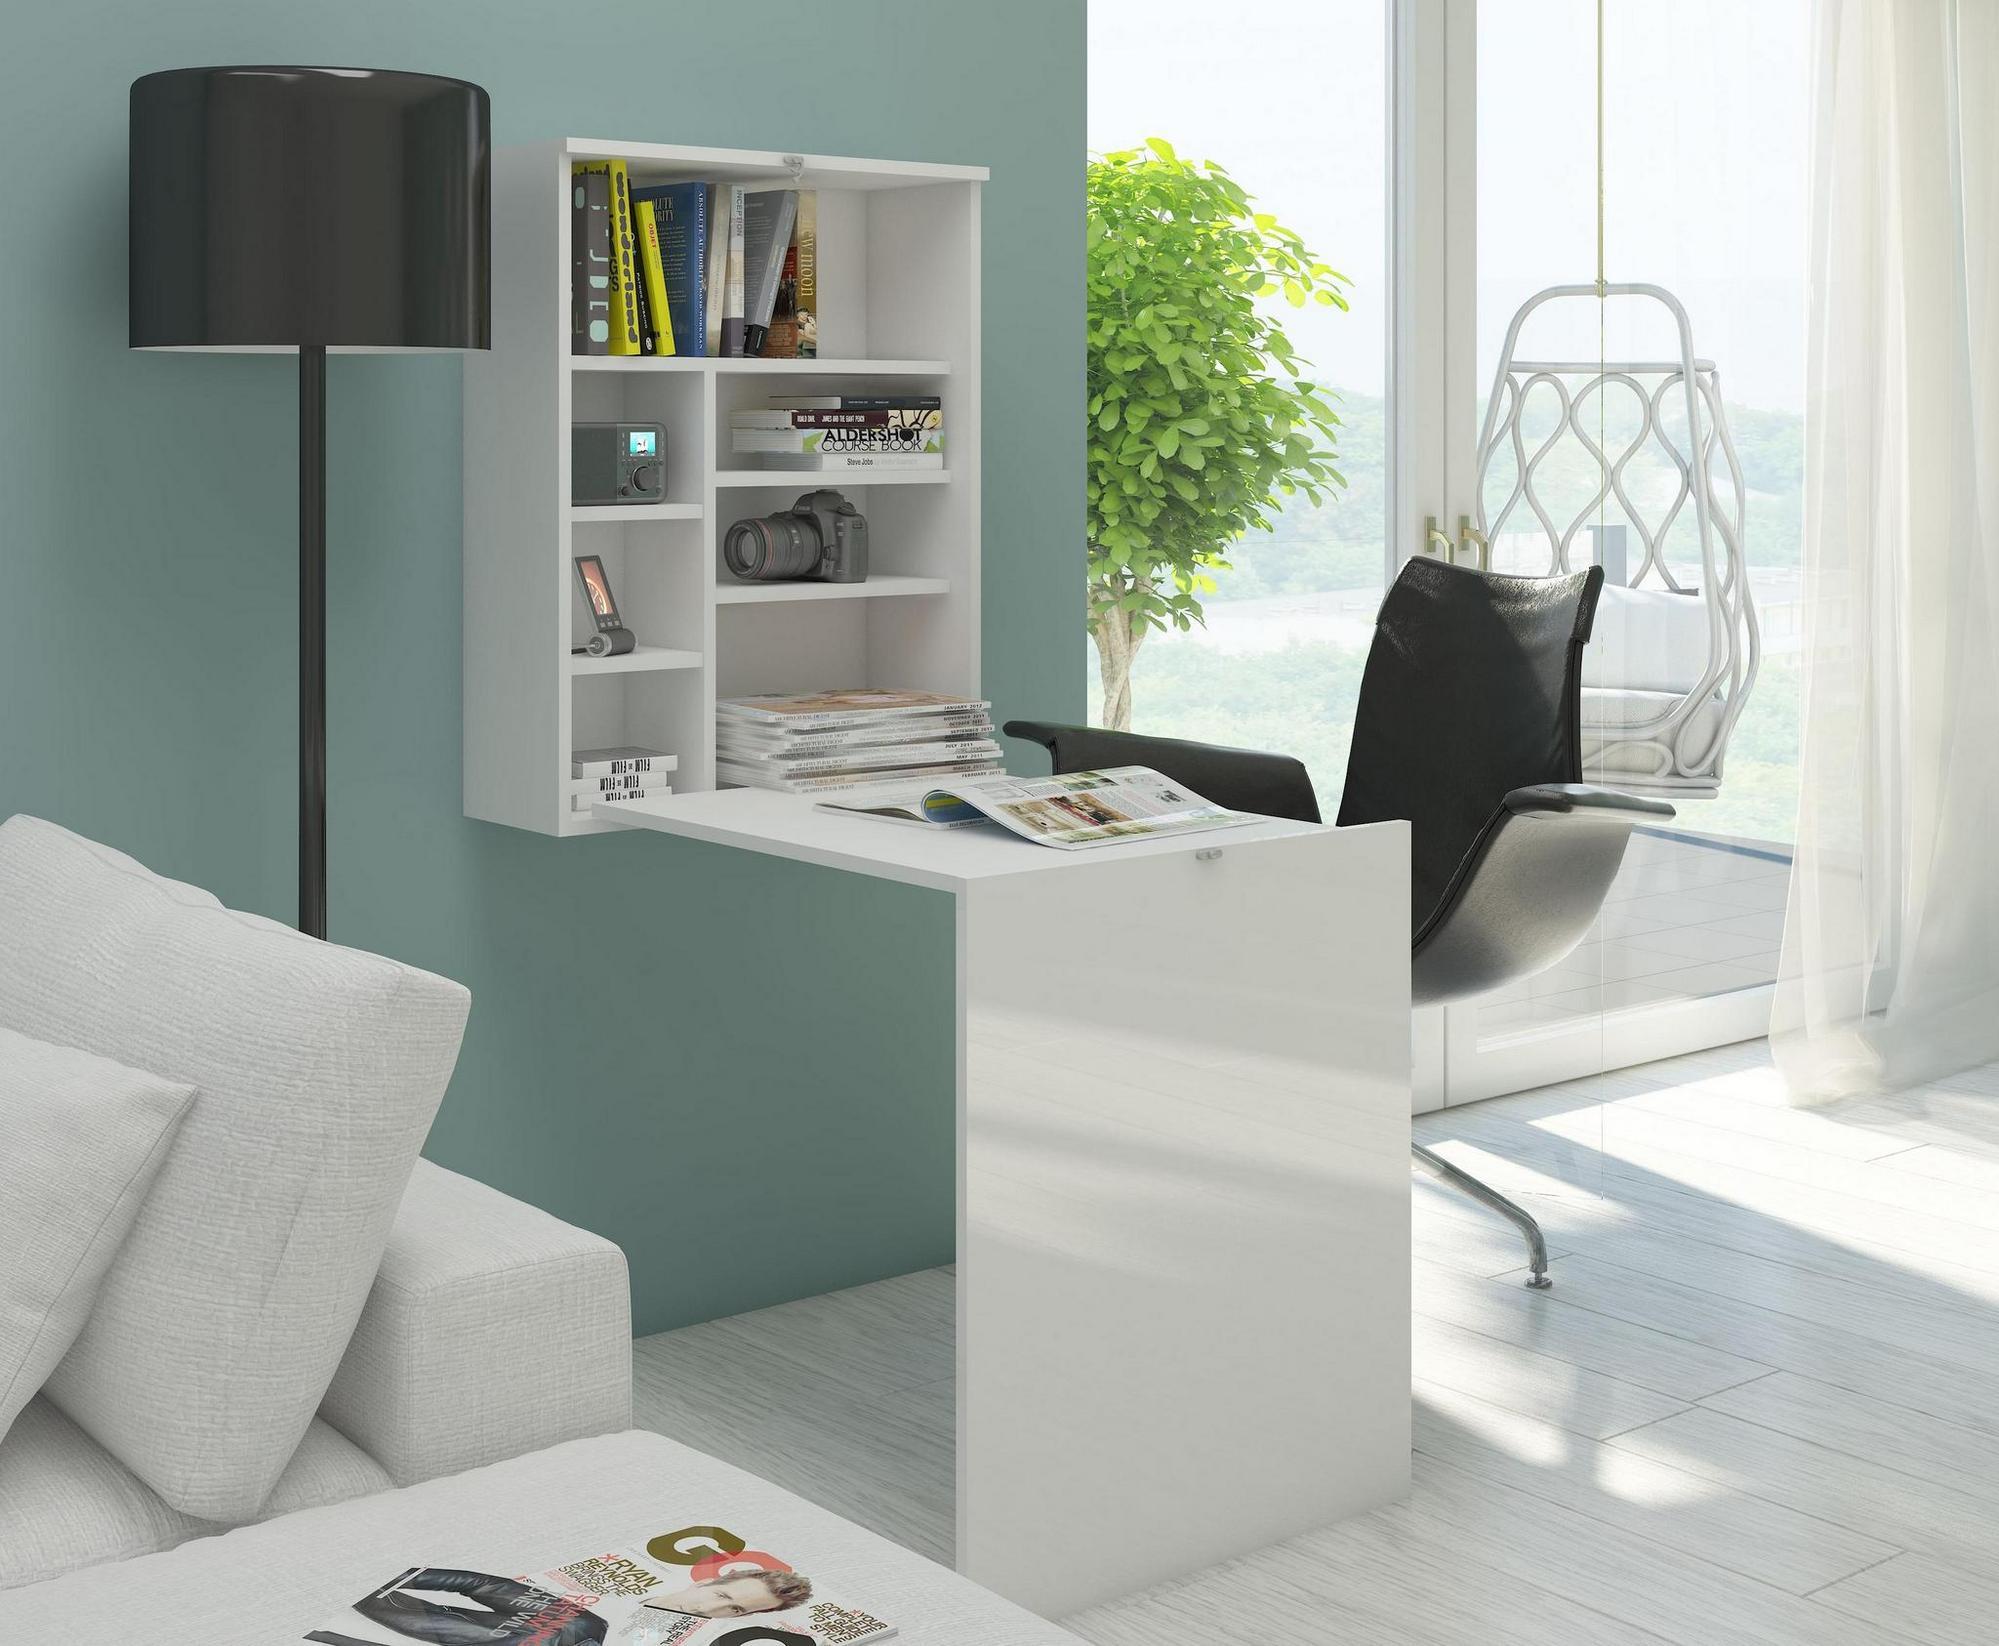 Berühmt Wand Schreibtisch weiss matt Bürotisch Tisch Arbeitstisch Esstisch QM47